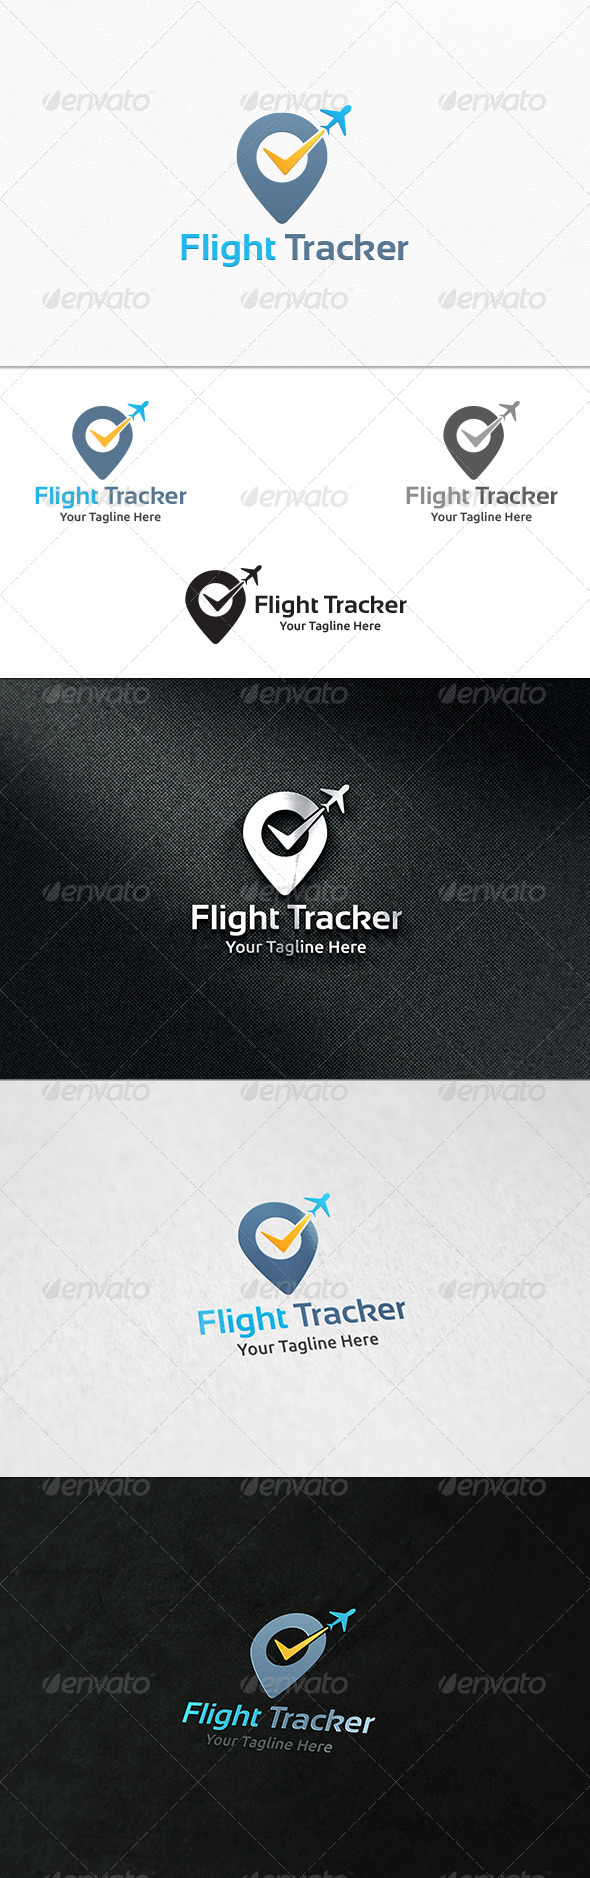 GraphicRiver Flight Tracker Logo Template 8000737